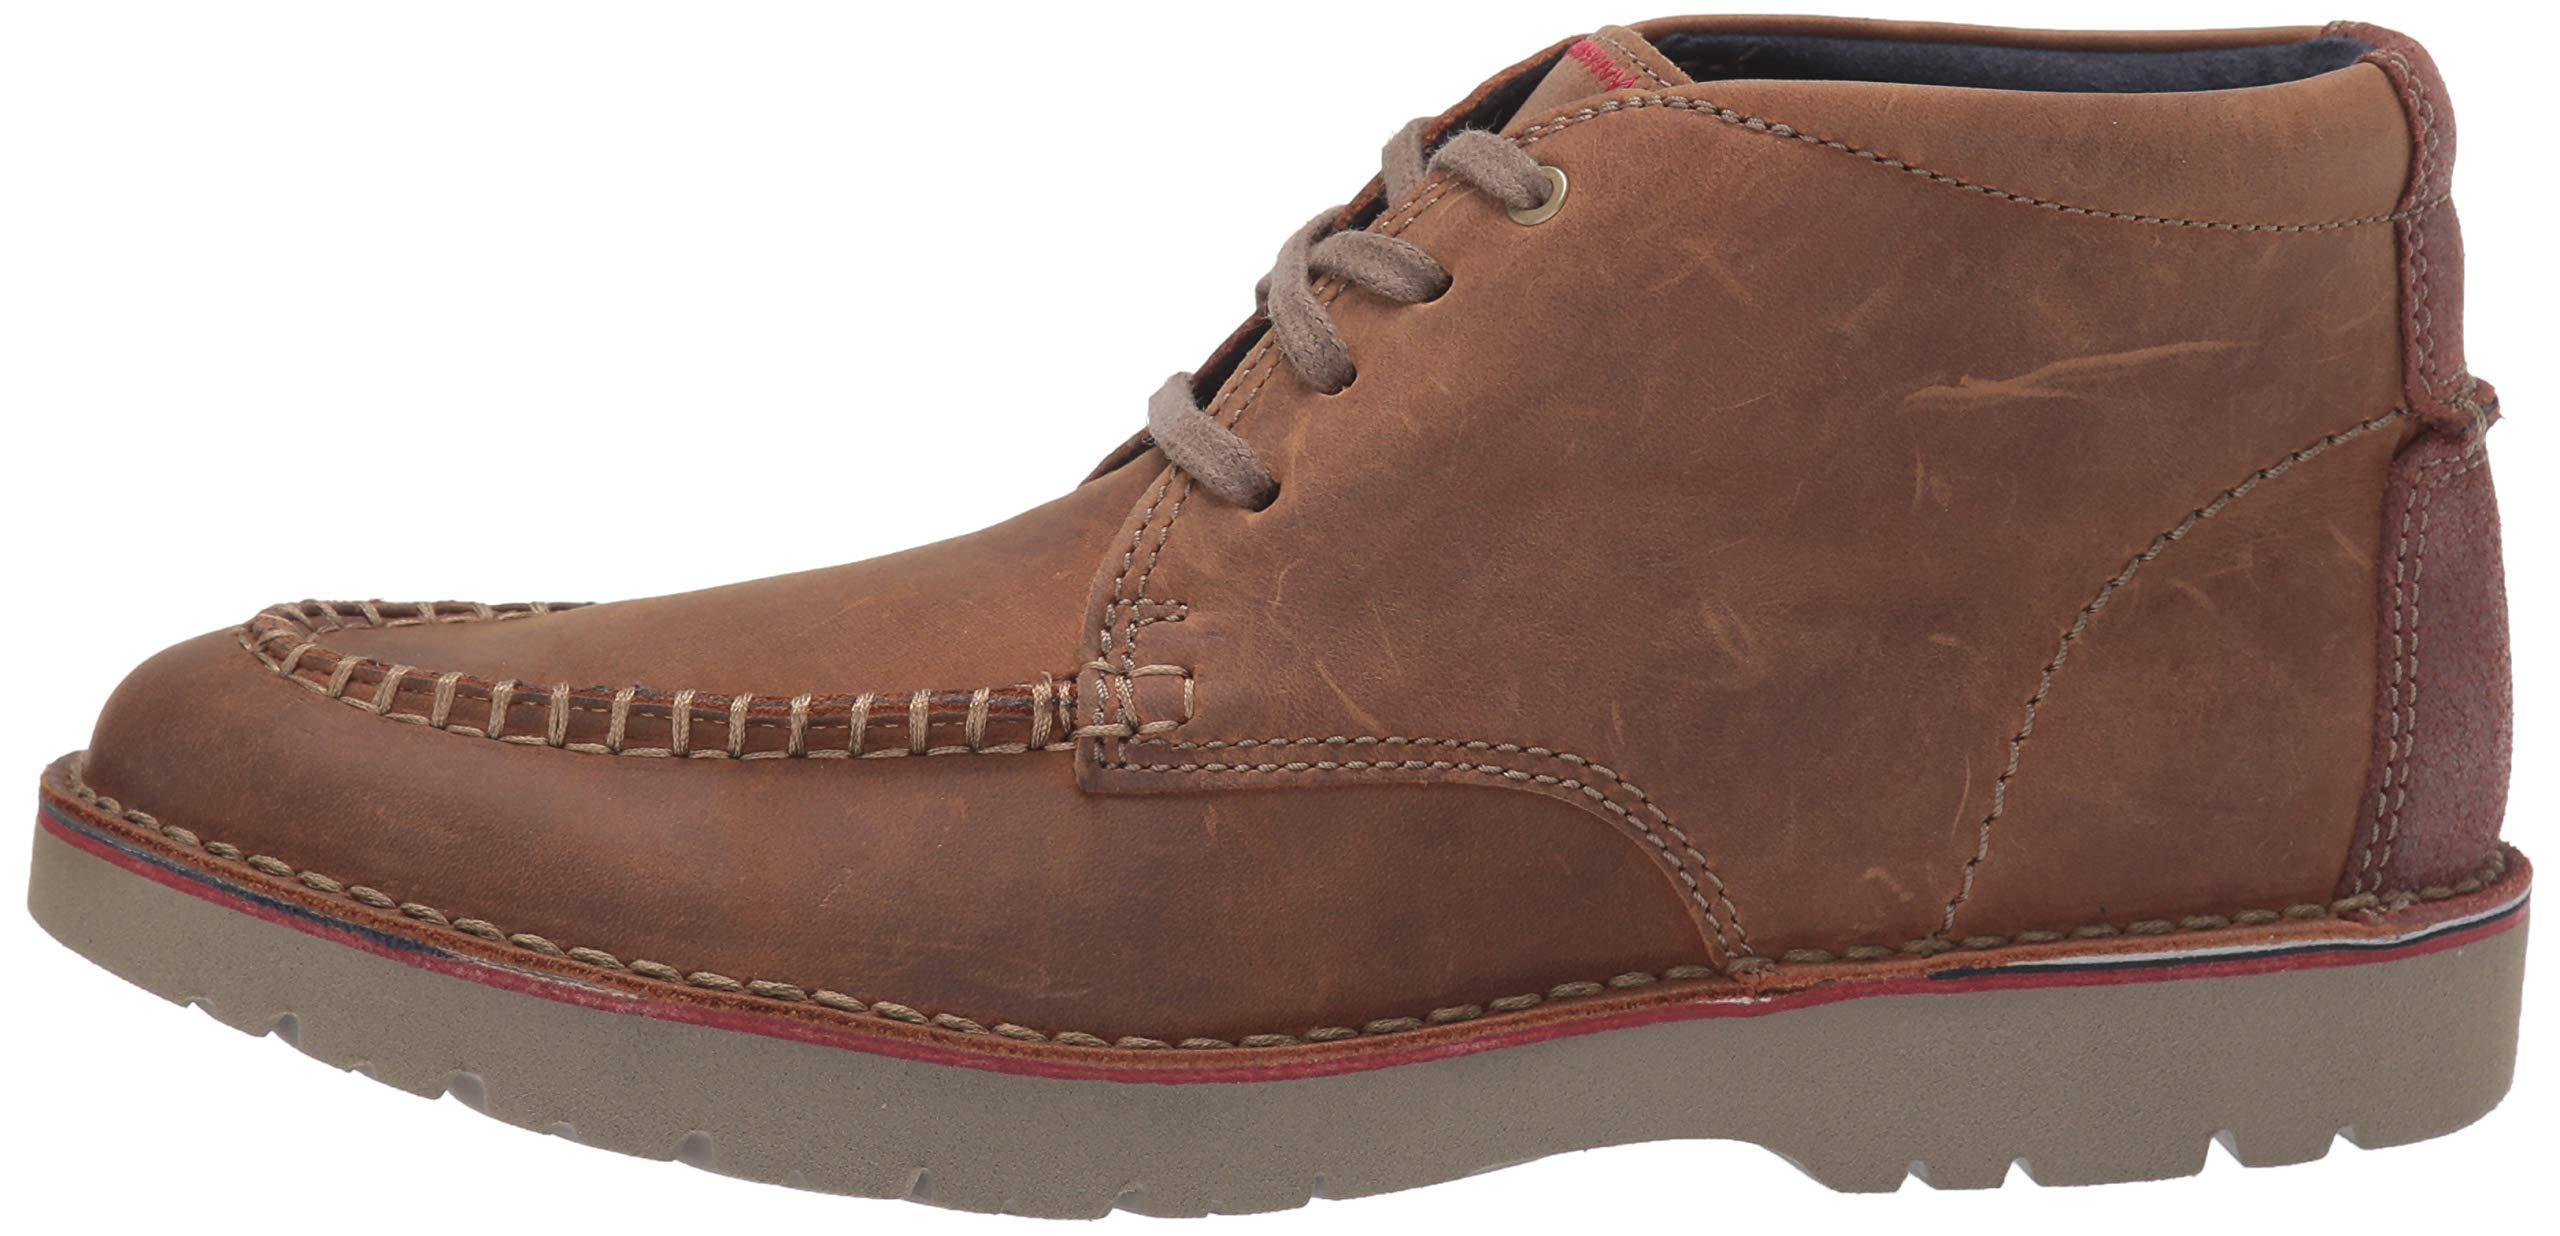 Clarks Men's Vargo Apron Ankle Boot 5